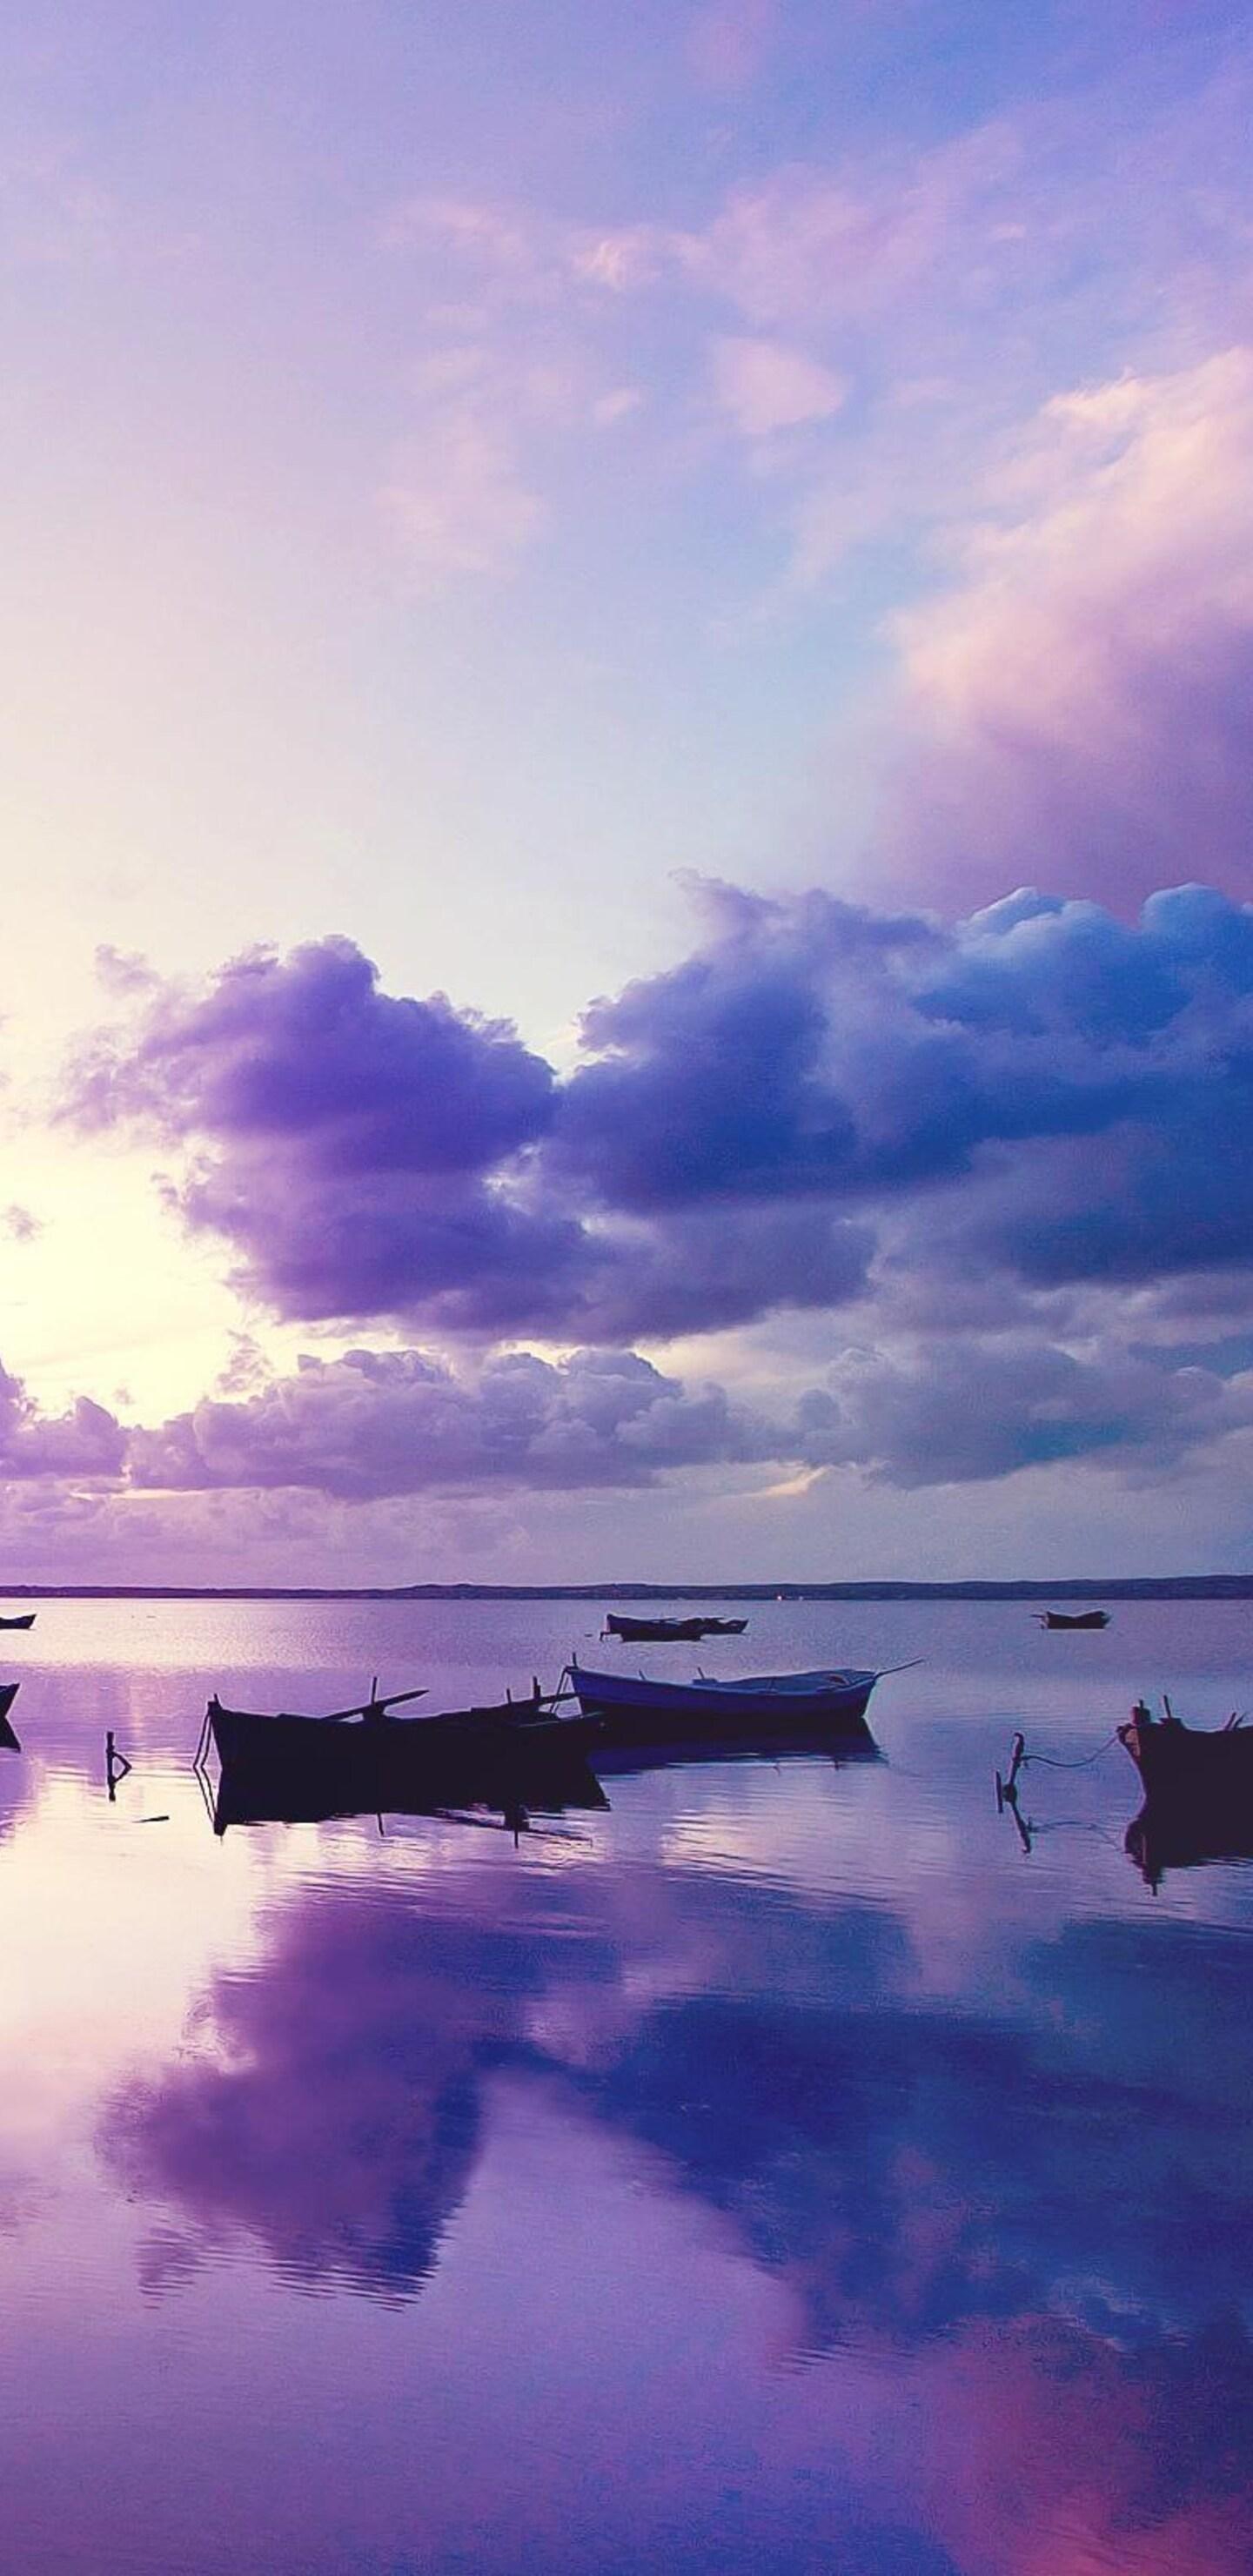 purple-sunset-in-ocean.jpg